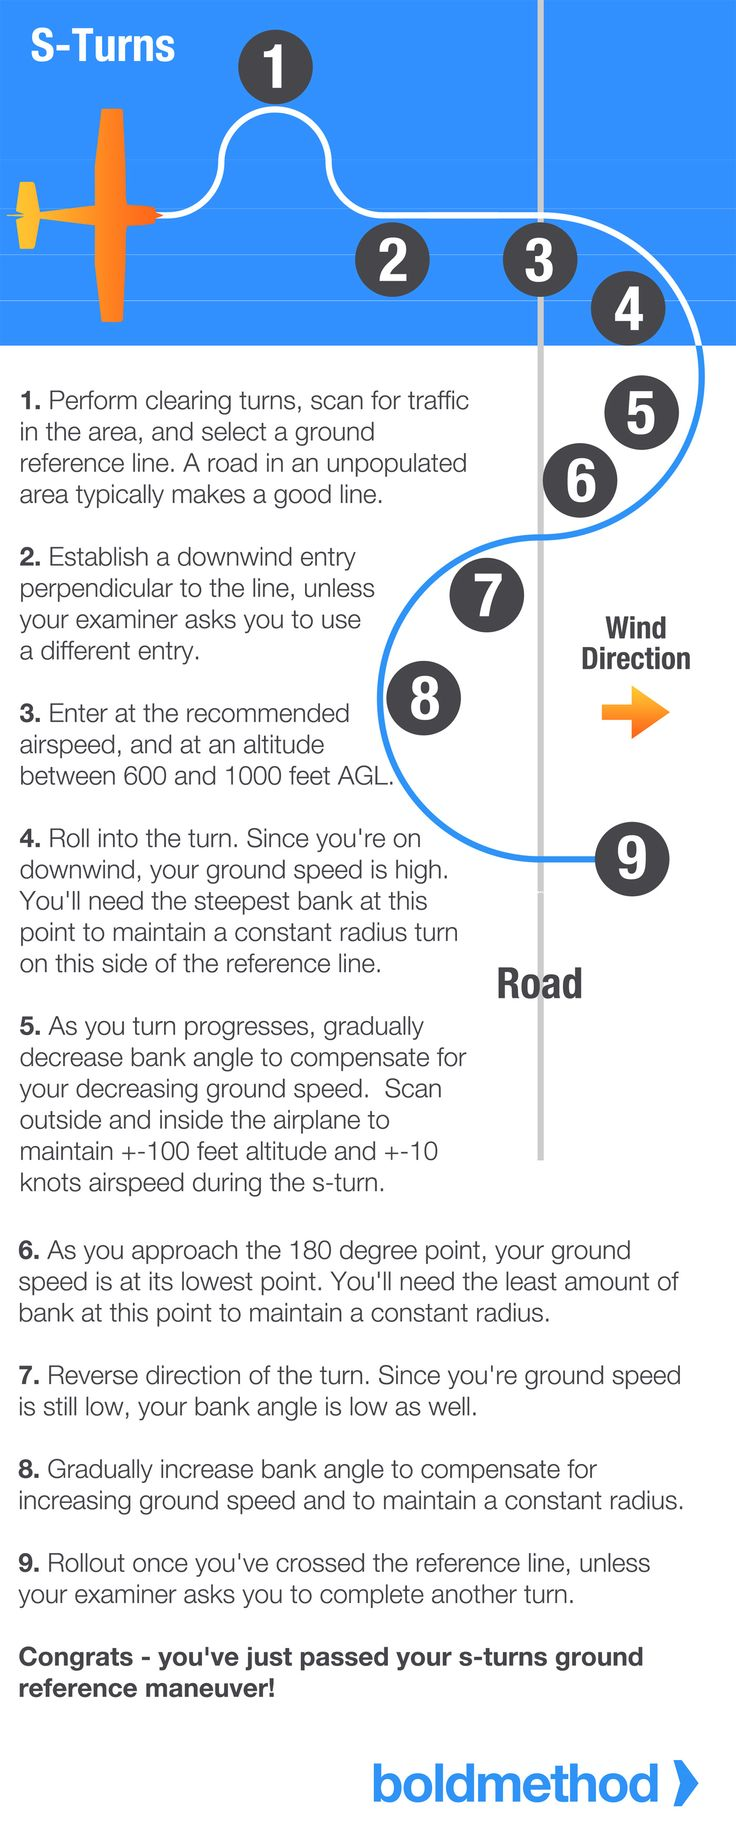 S-Turns Infographic: PTS Standards and Tactics via BoldMethod